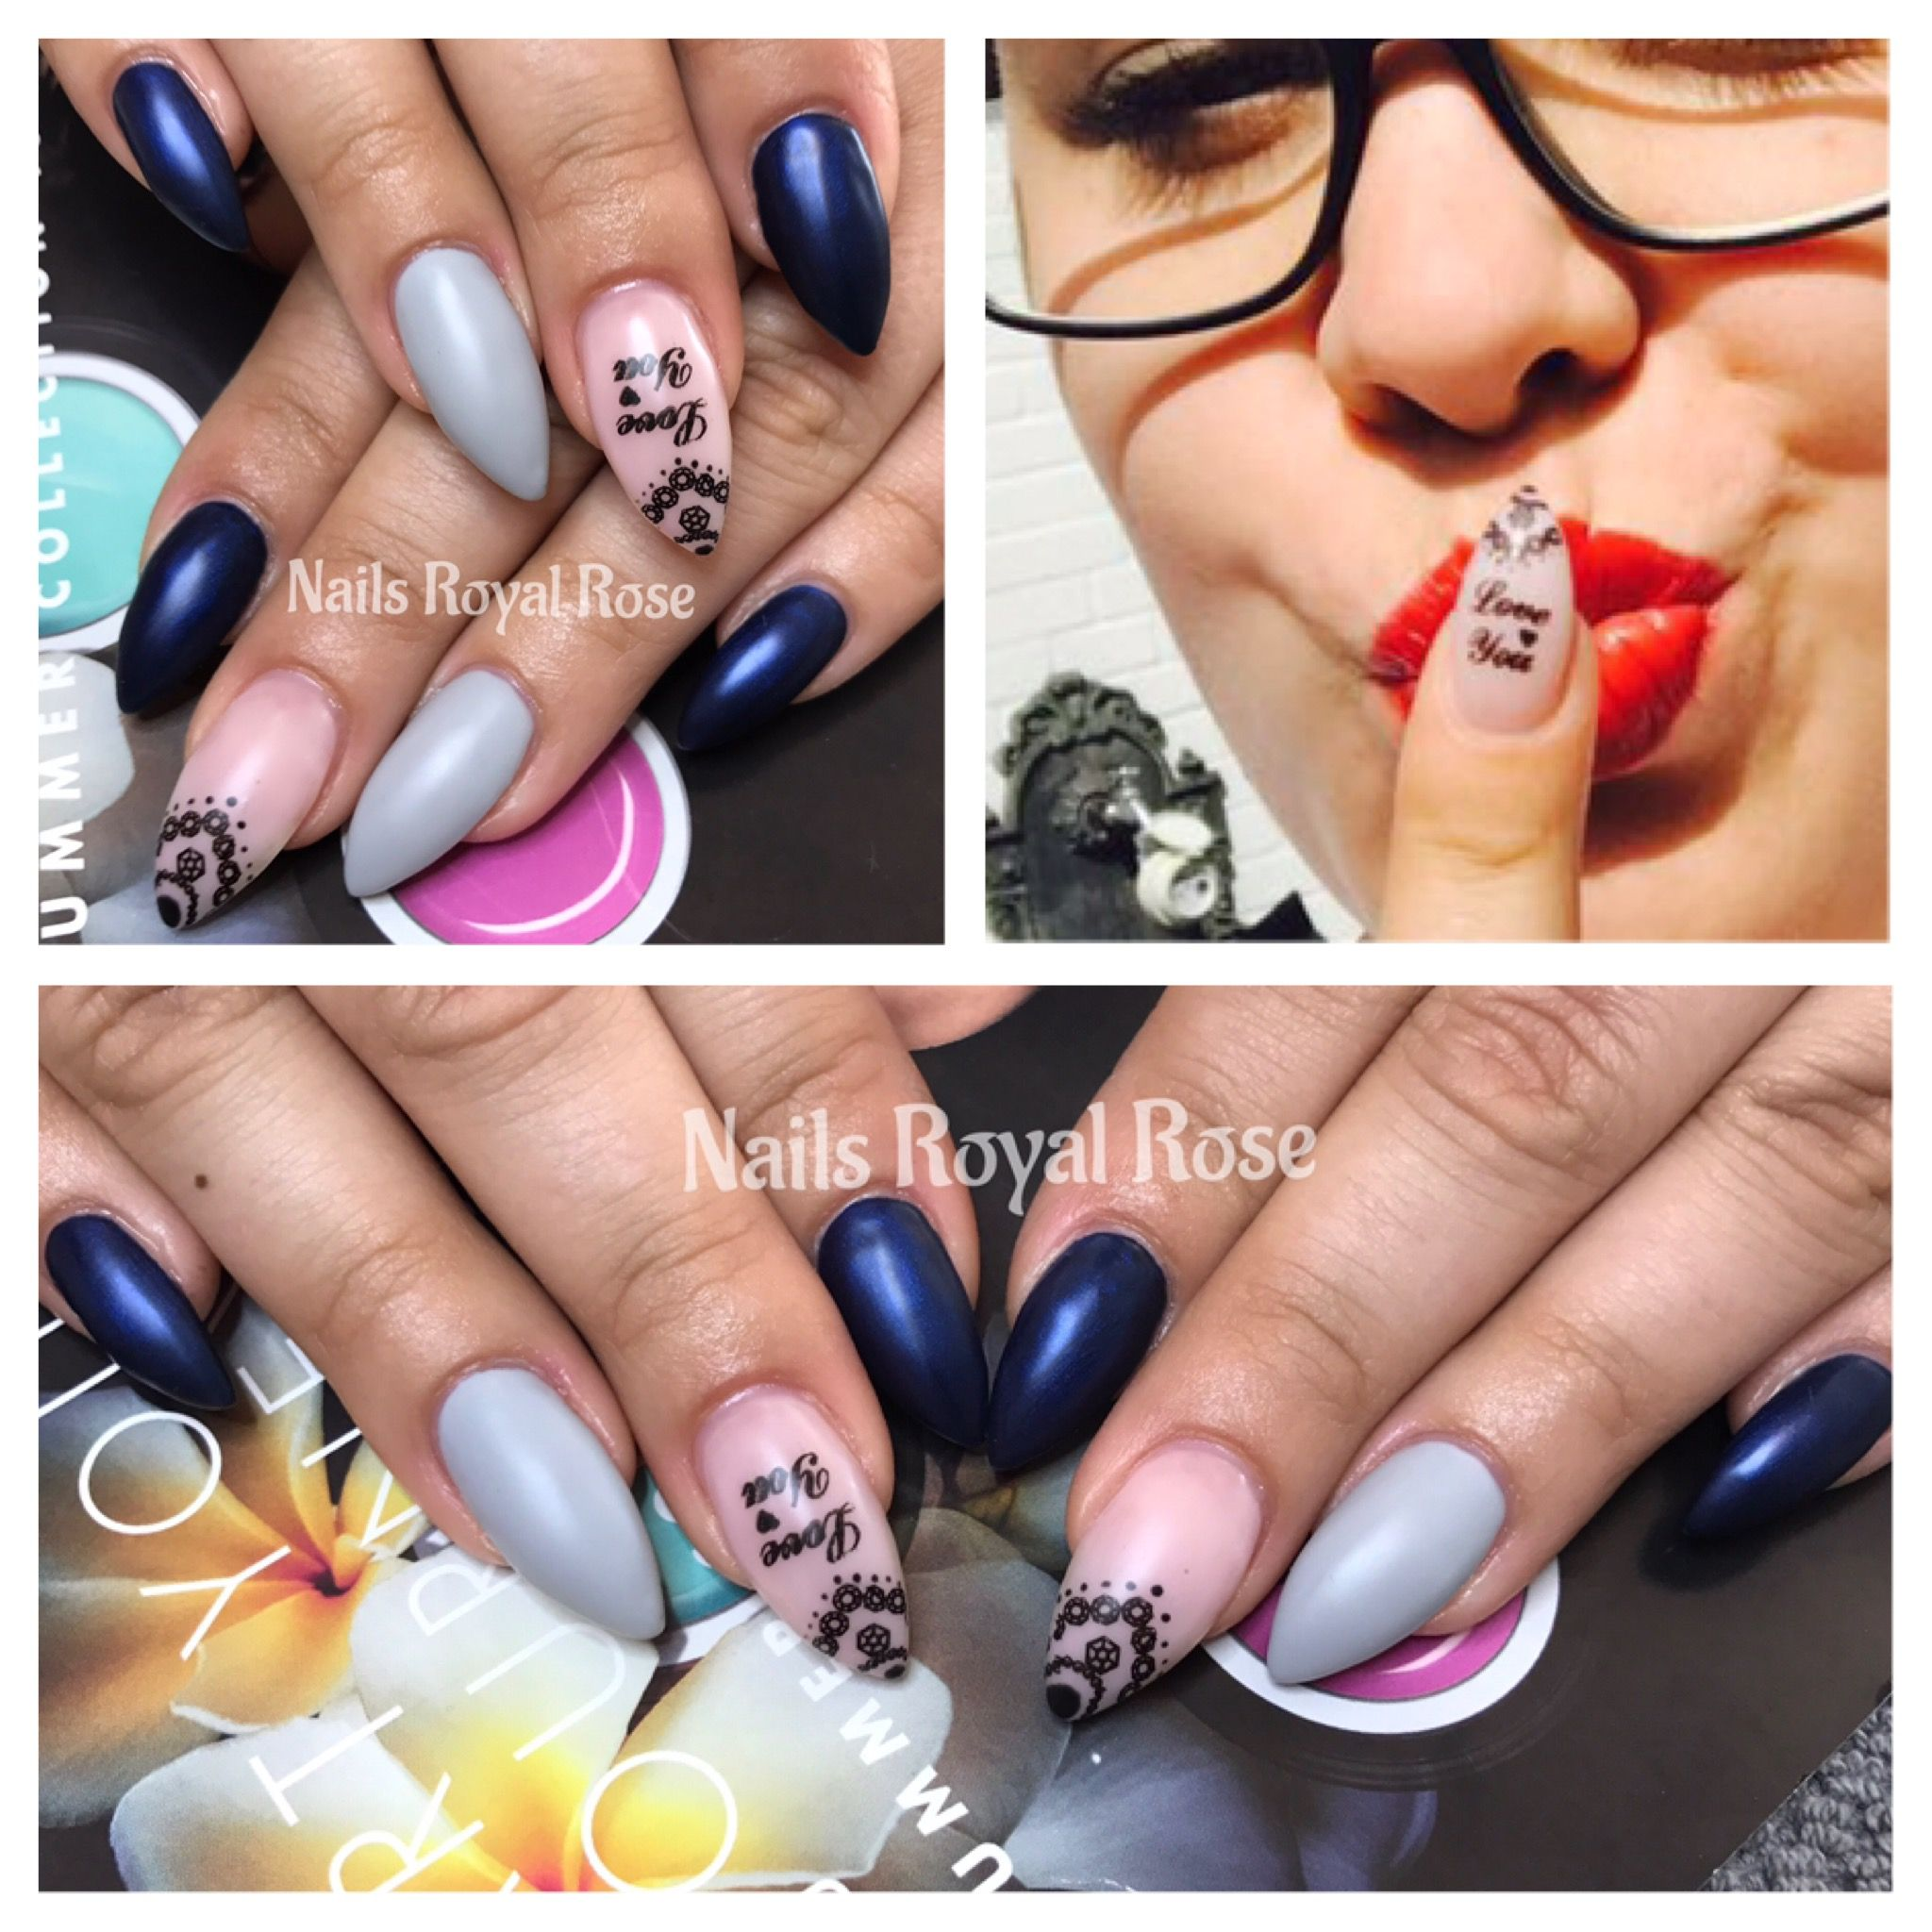 Nails , Nägel, Nagelmodellage, Nails Royal Rose, Nailart, Glitter ...